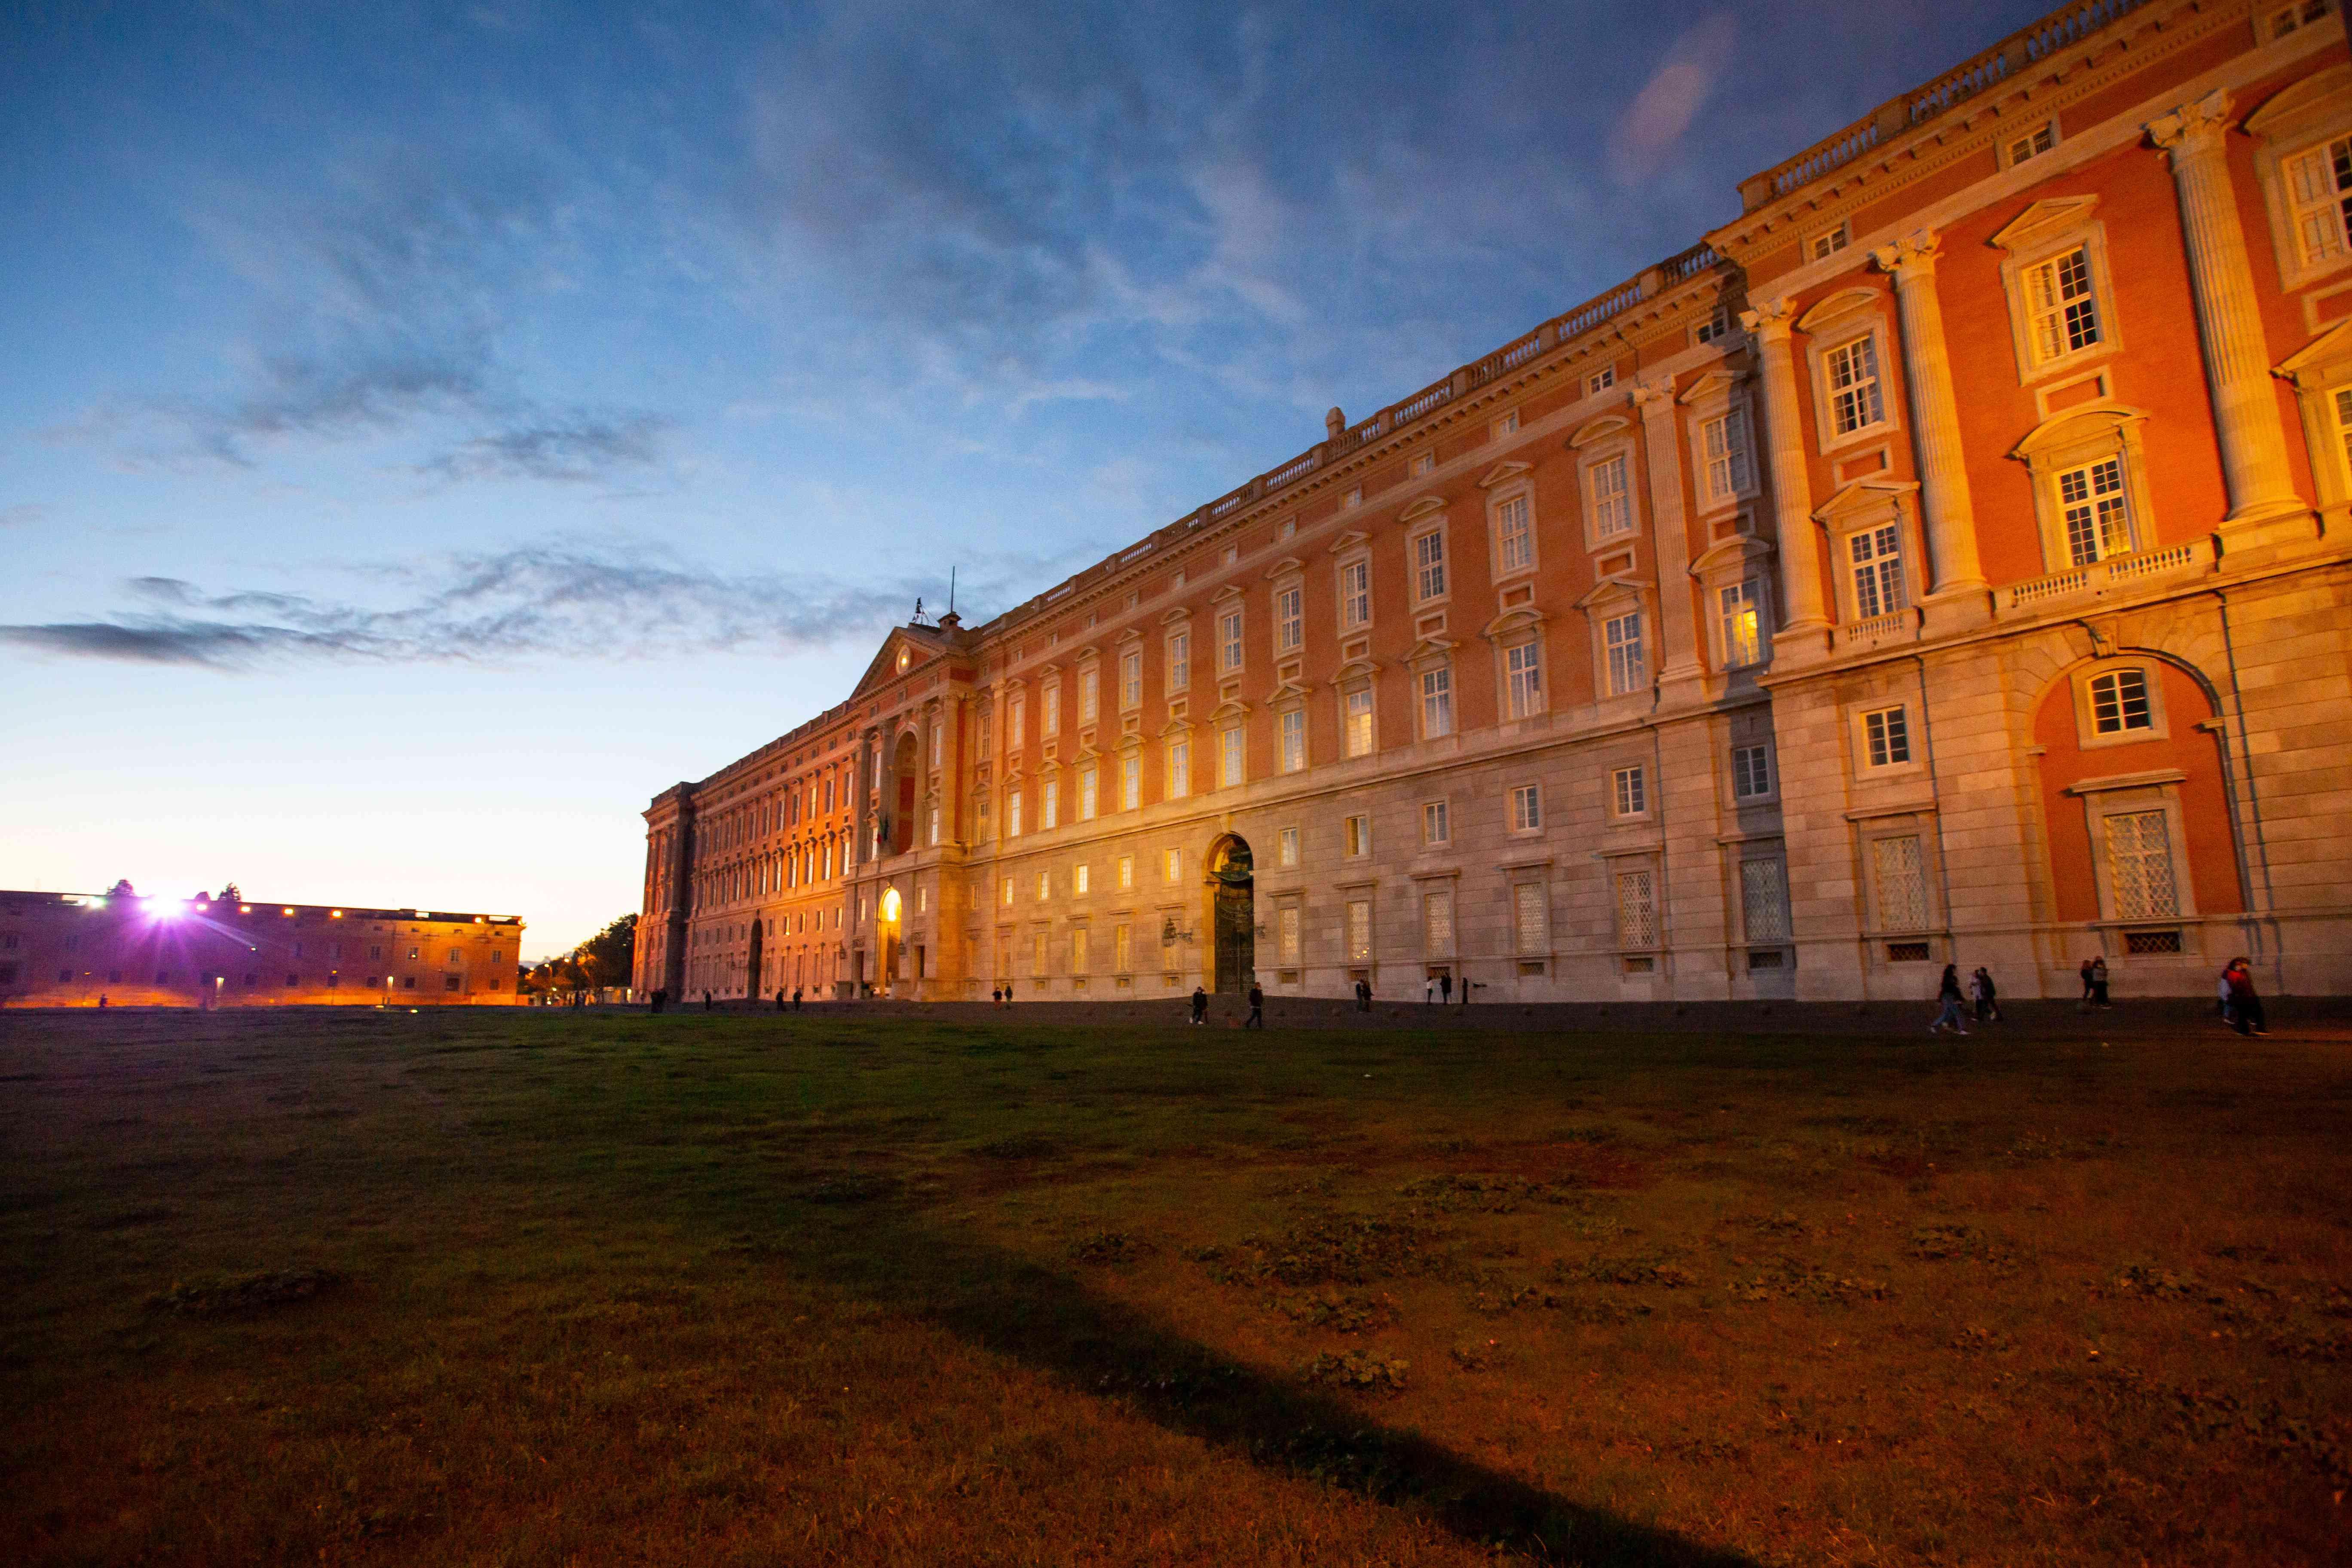 Caserta Royal Palace in Italy